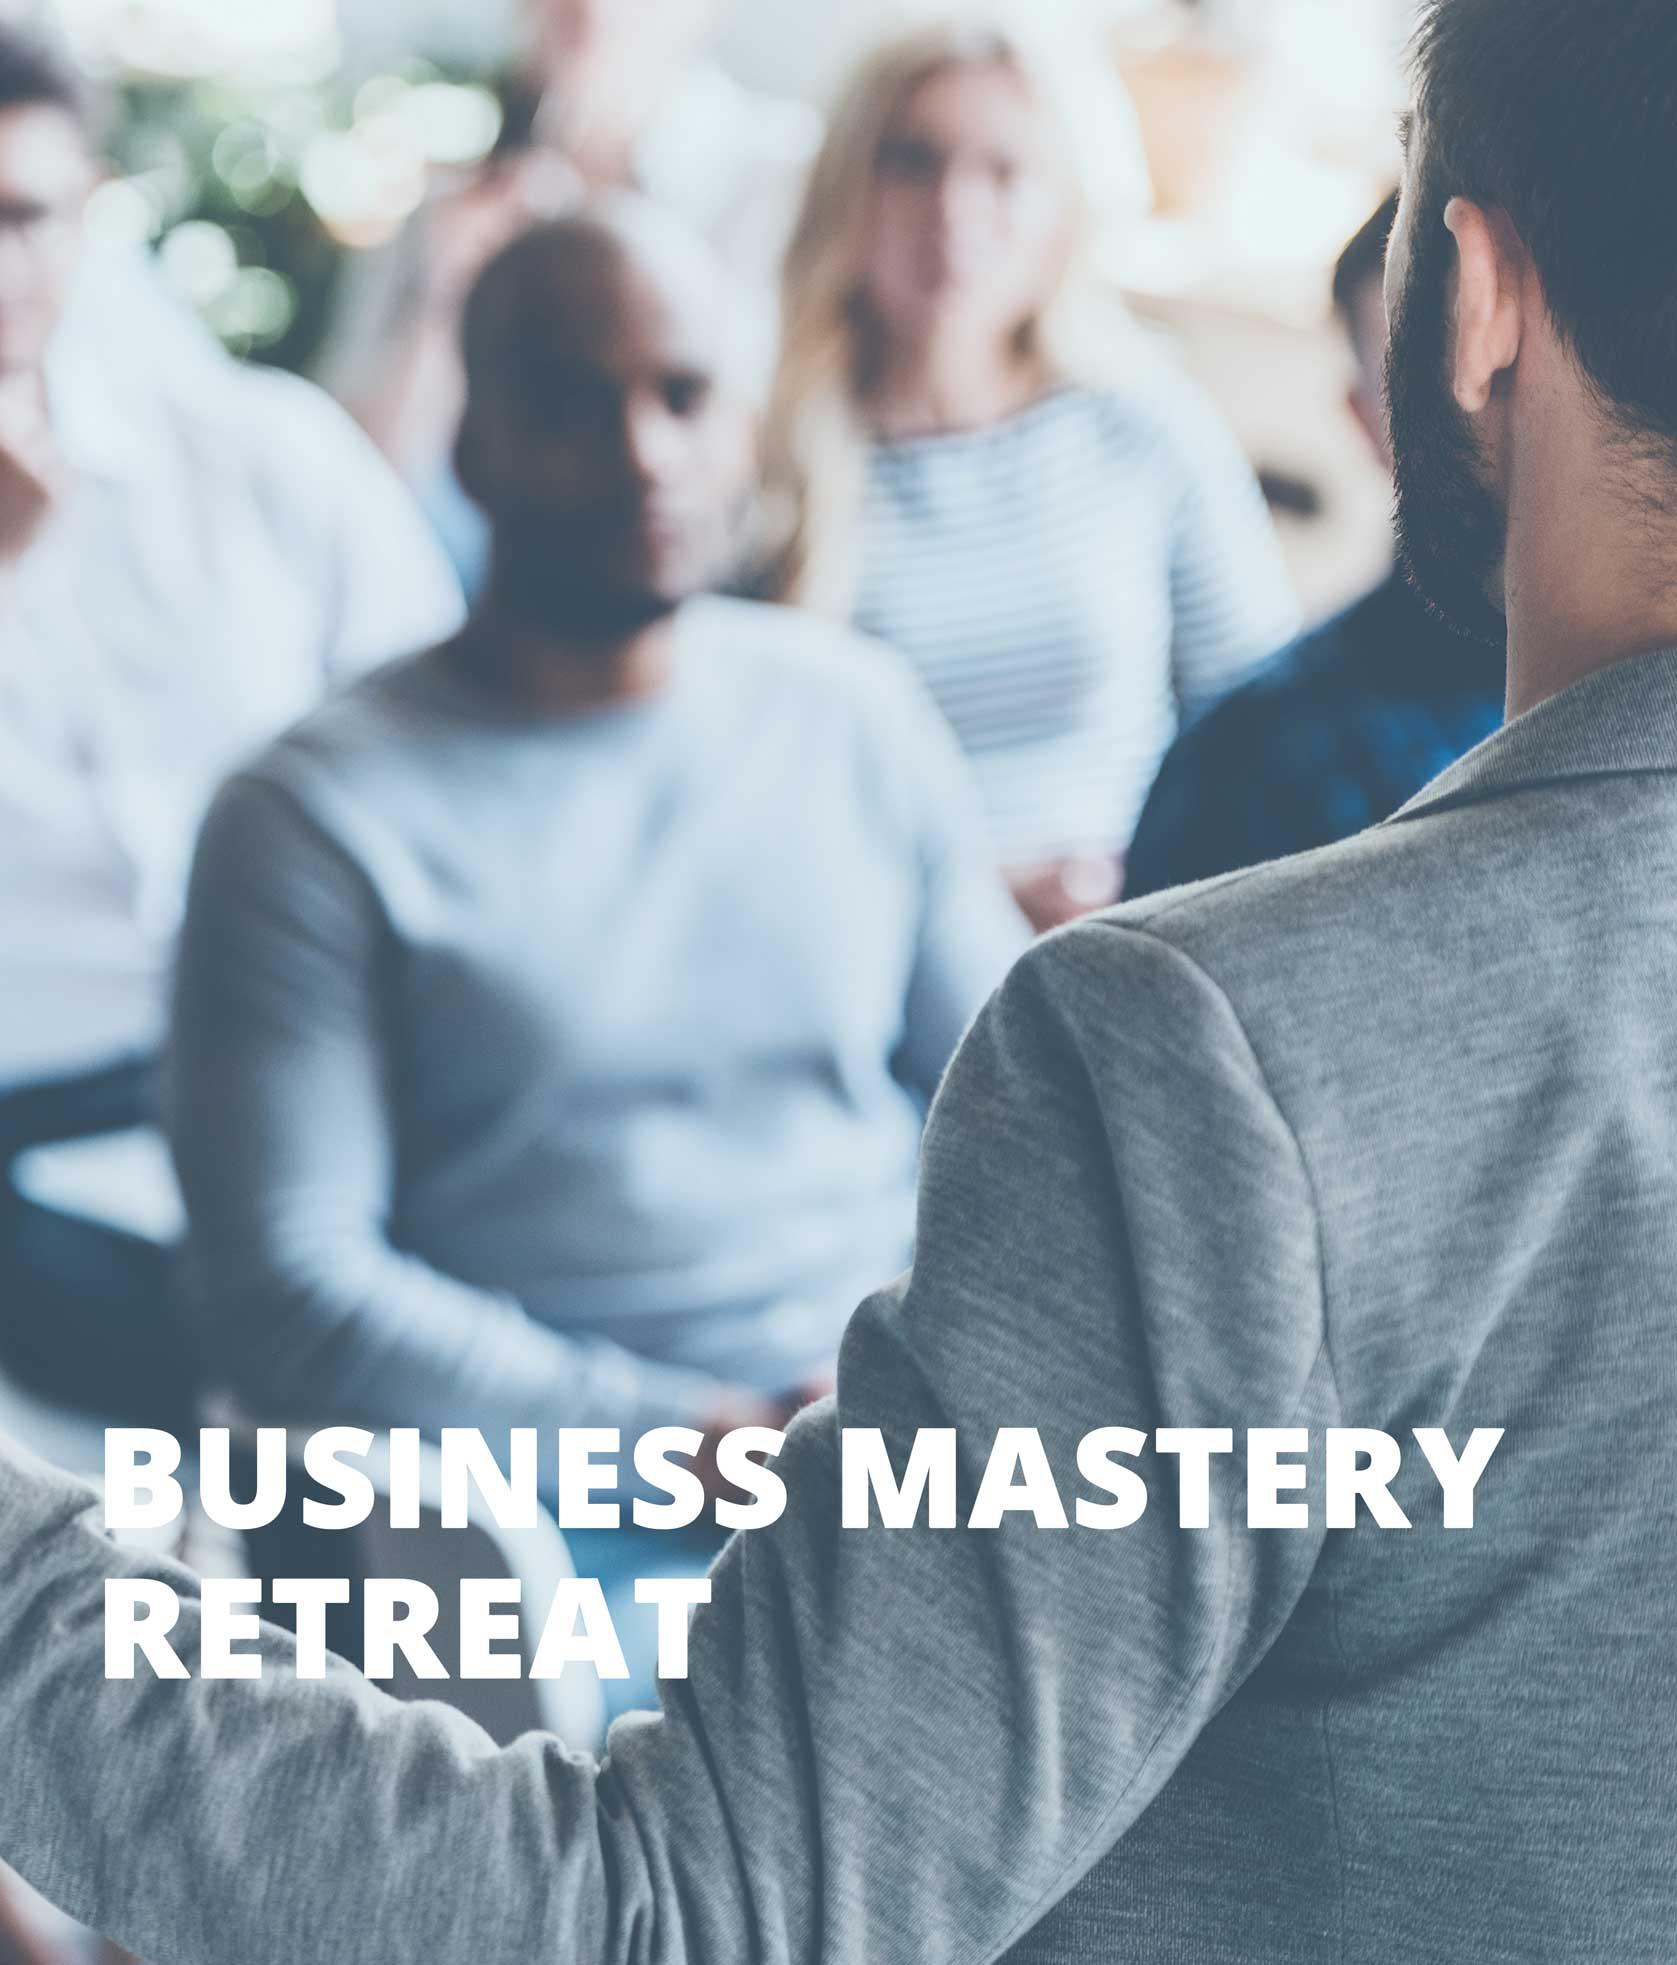 business mastery retreat